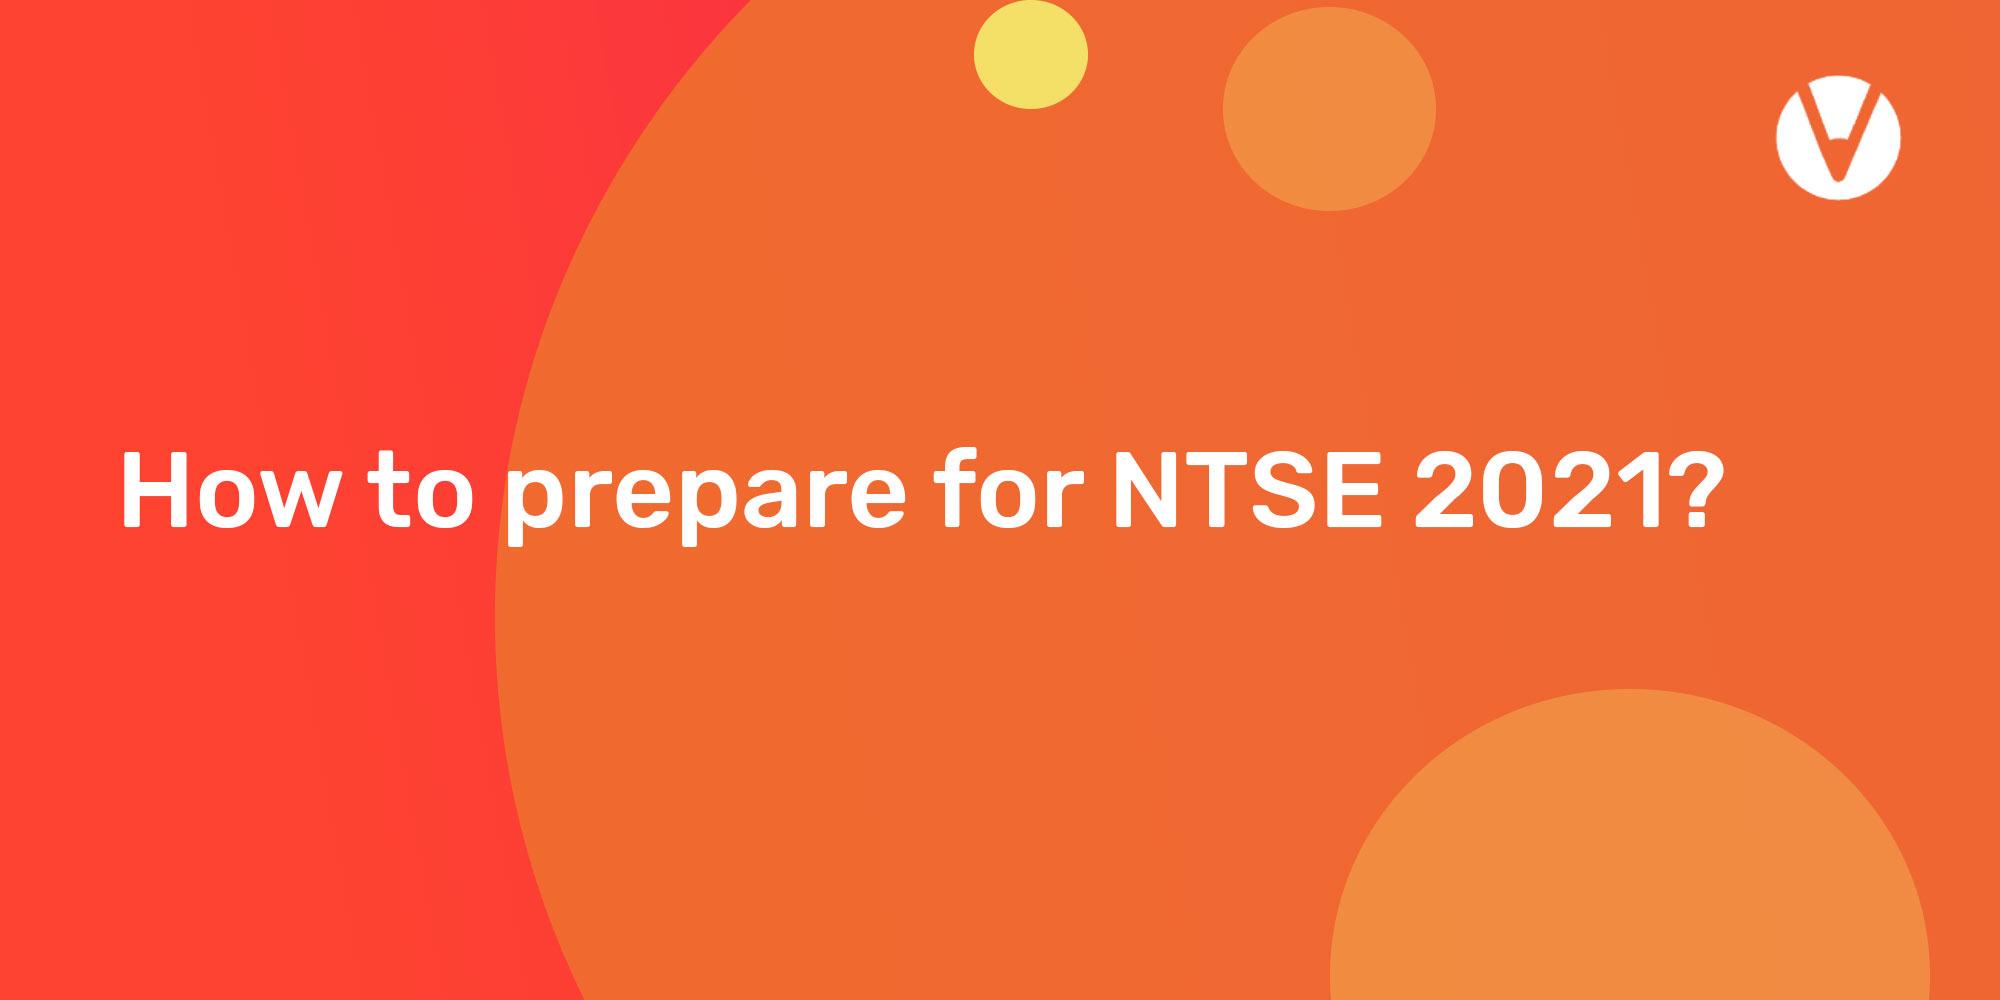 NTSE - India's Most Prestigious Exam